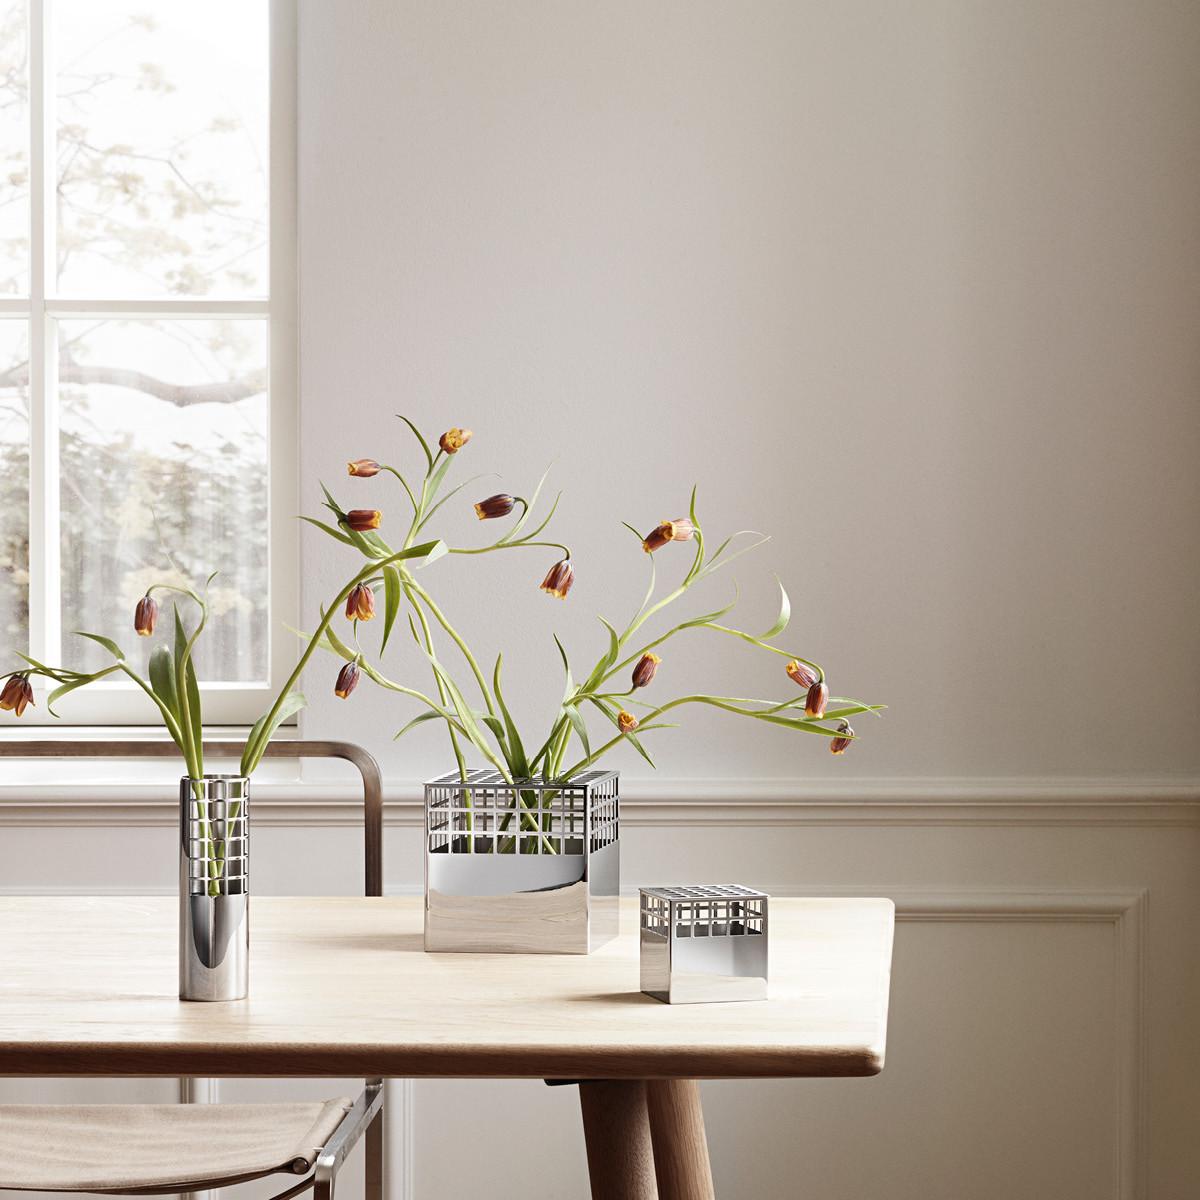 georg jensen green vase of exclusive sale inside home dacor 20 saving